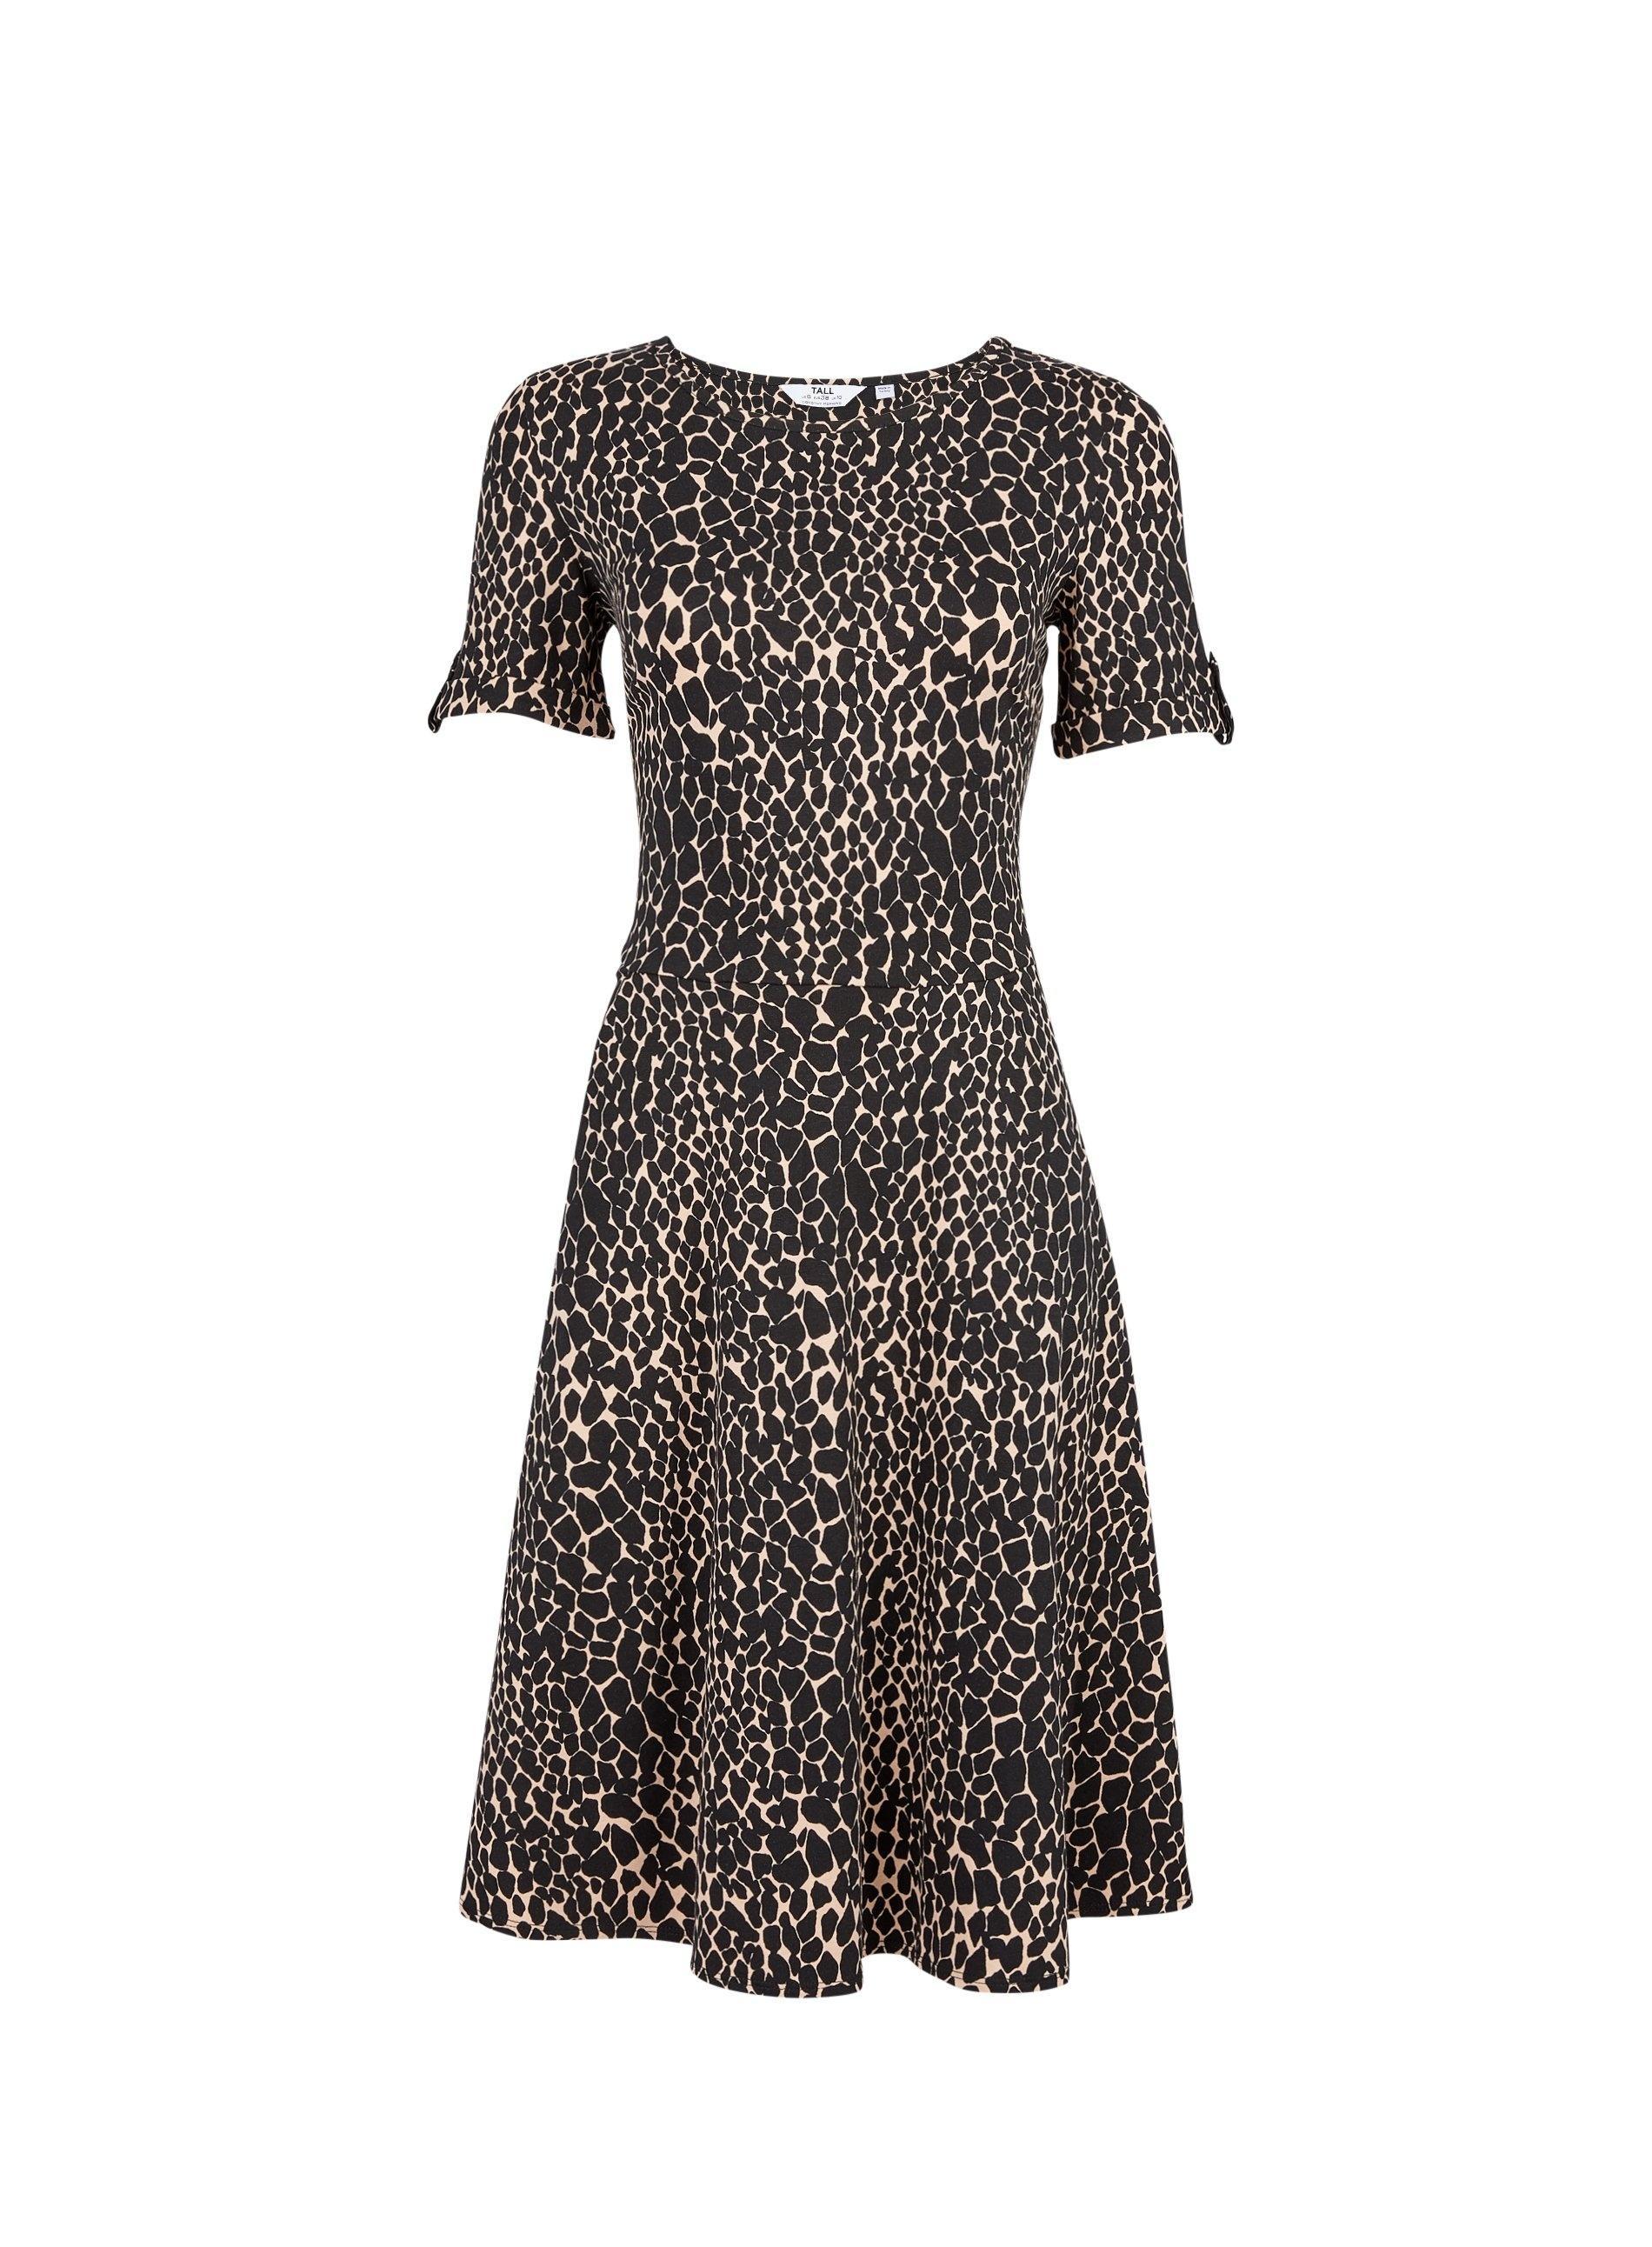 da00f048615 Dorothy Perkins - Black Tall Multi Coloured Giraffe Print T-shirt Dress -  Lyst. View fullscreen